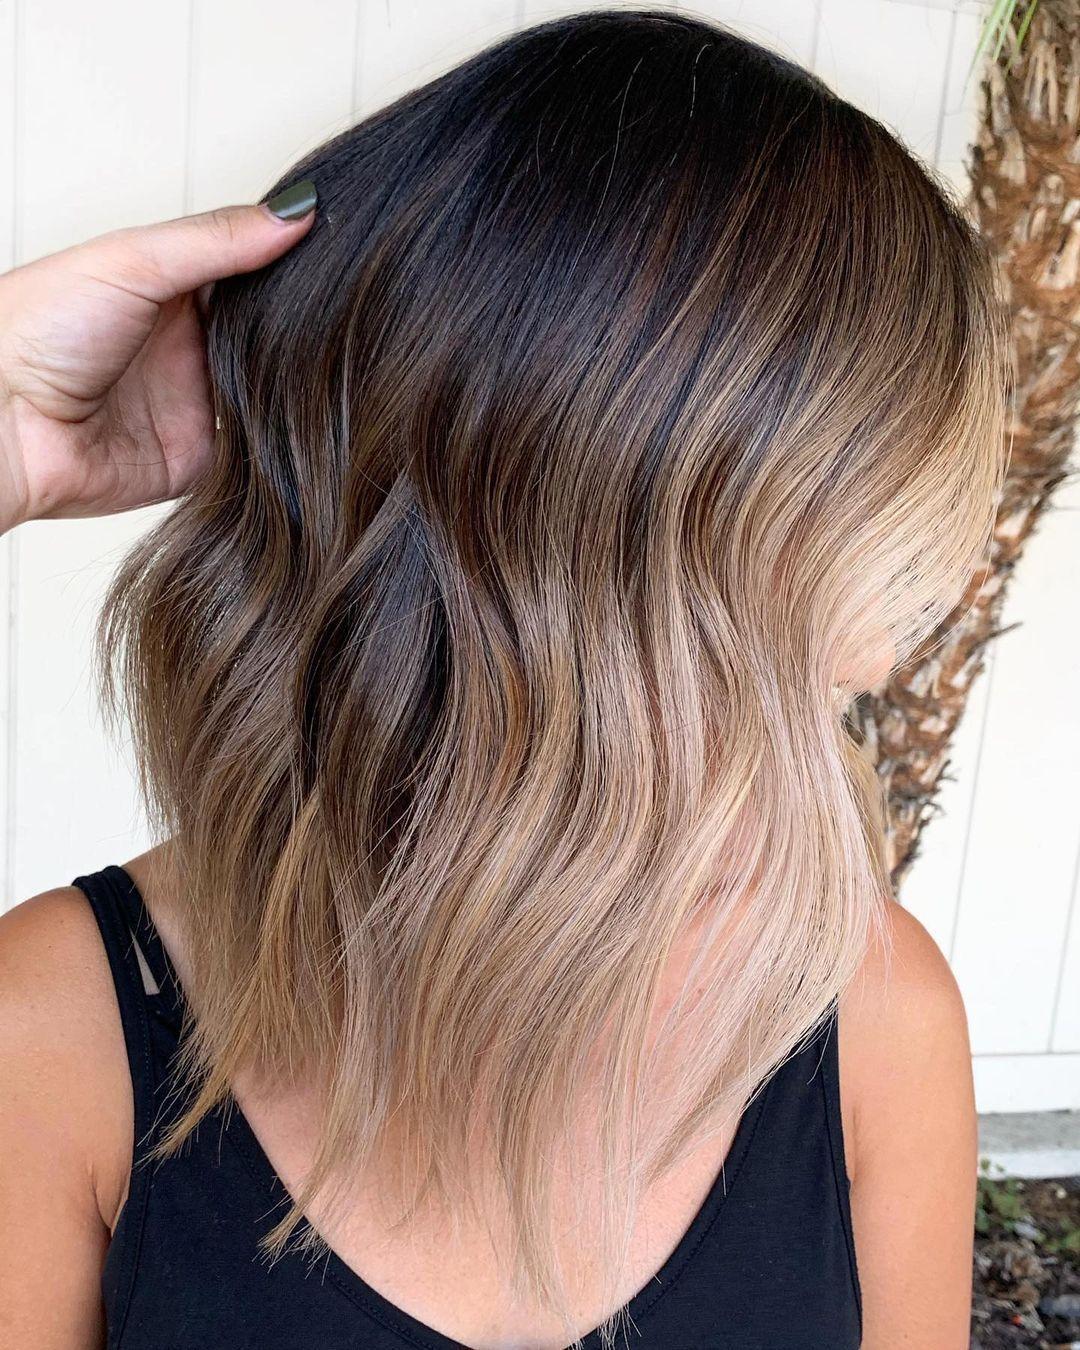 50 Amazing Blonde Balayage Hair Color Ideas For 2021 Hair Adviser Balayage Hair Blonde Balayage Hair Color Balayage